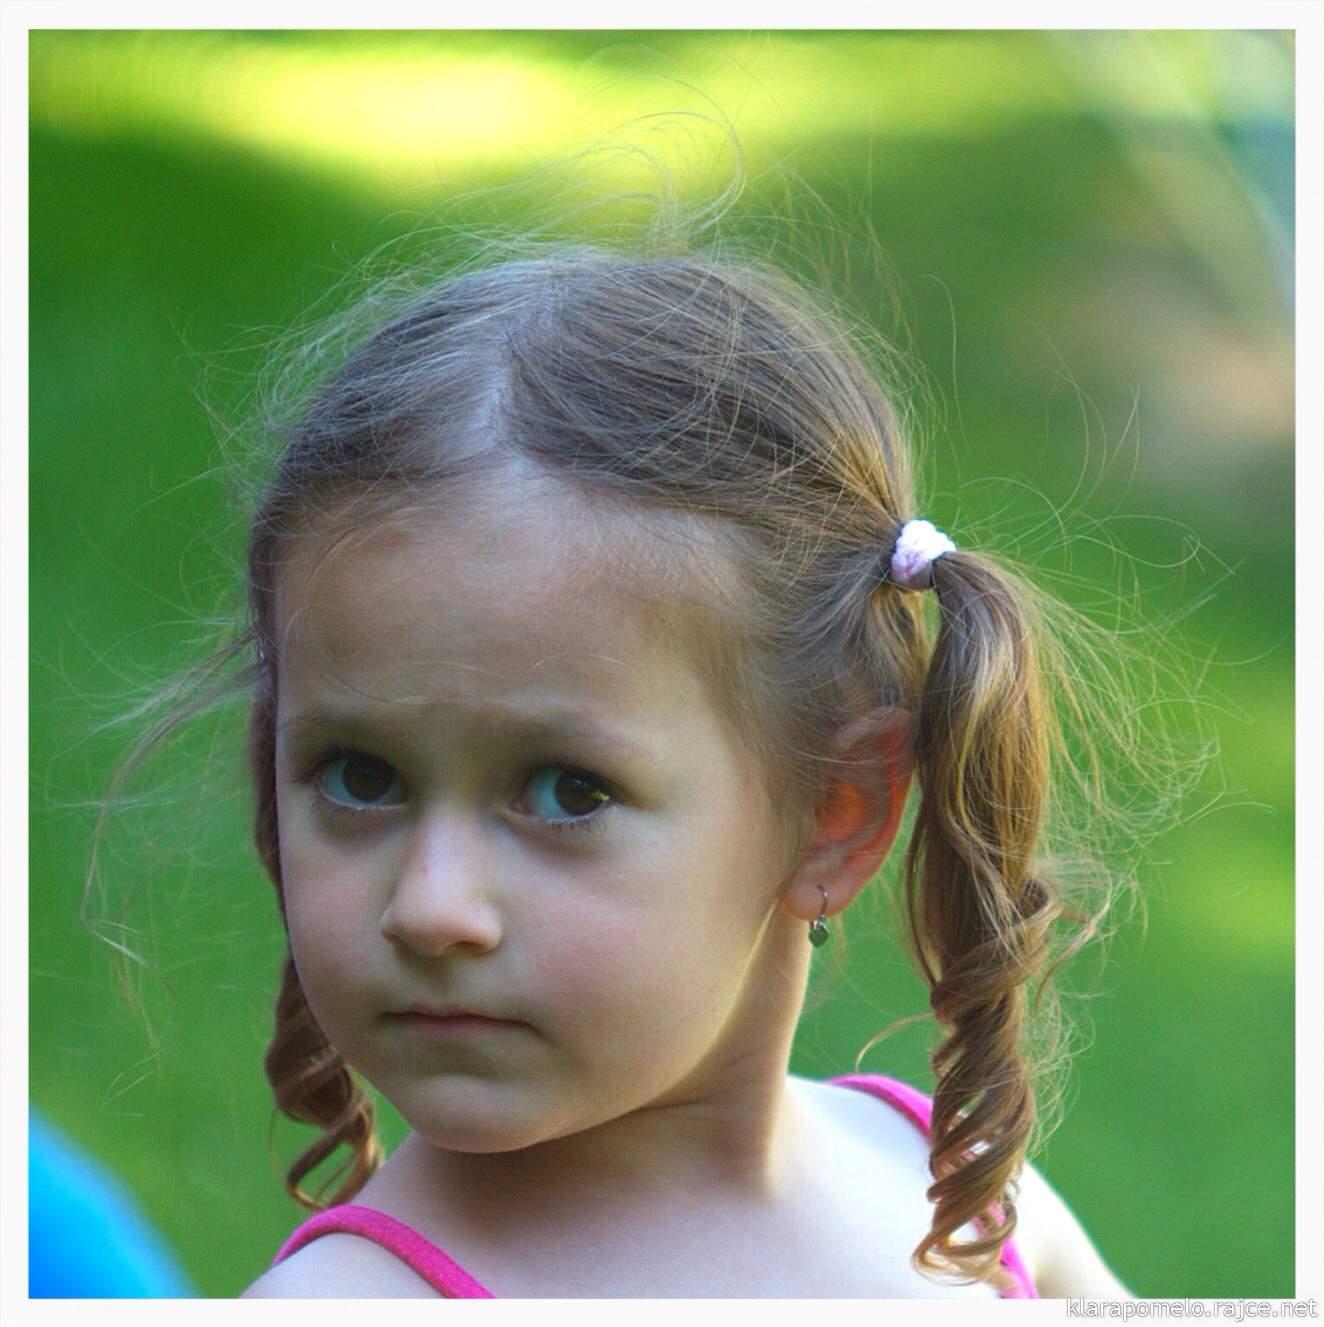 rajce.idnes.cz girl child pantyhose